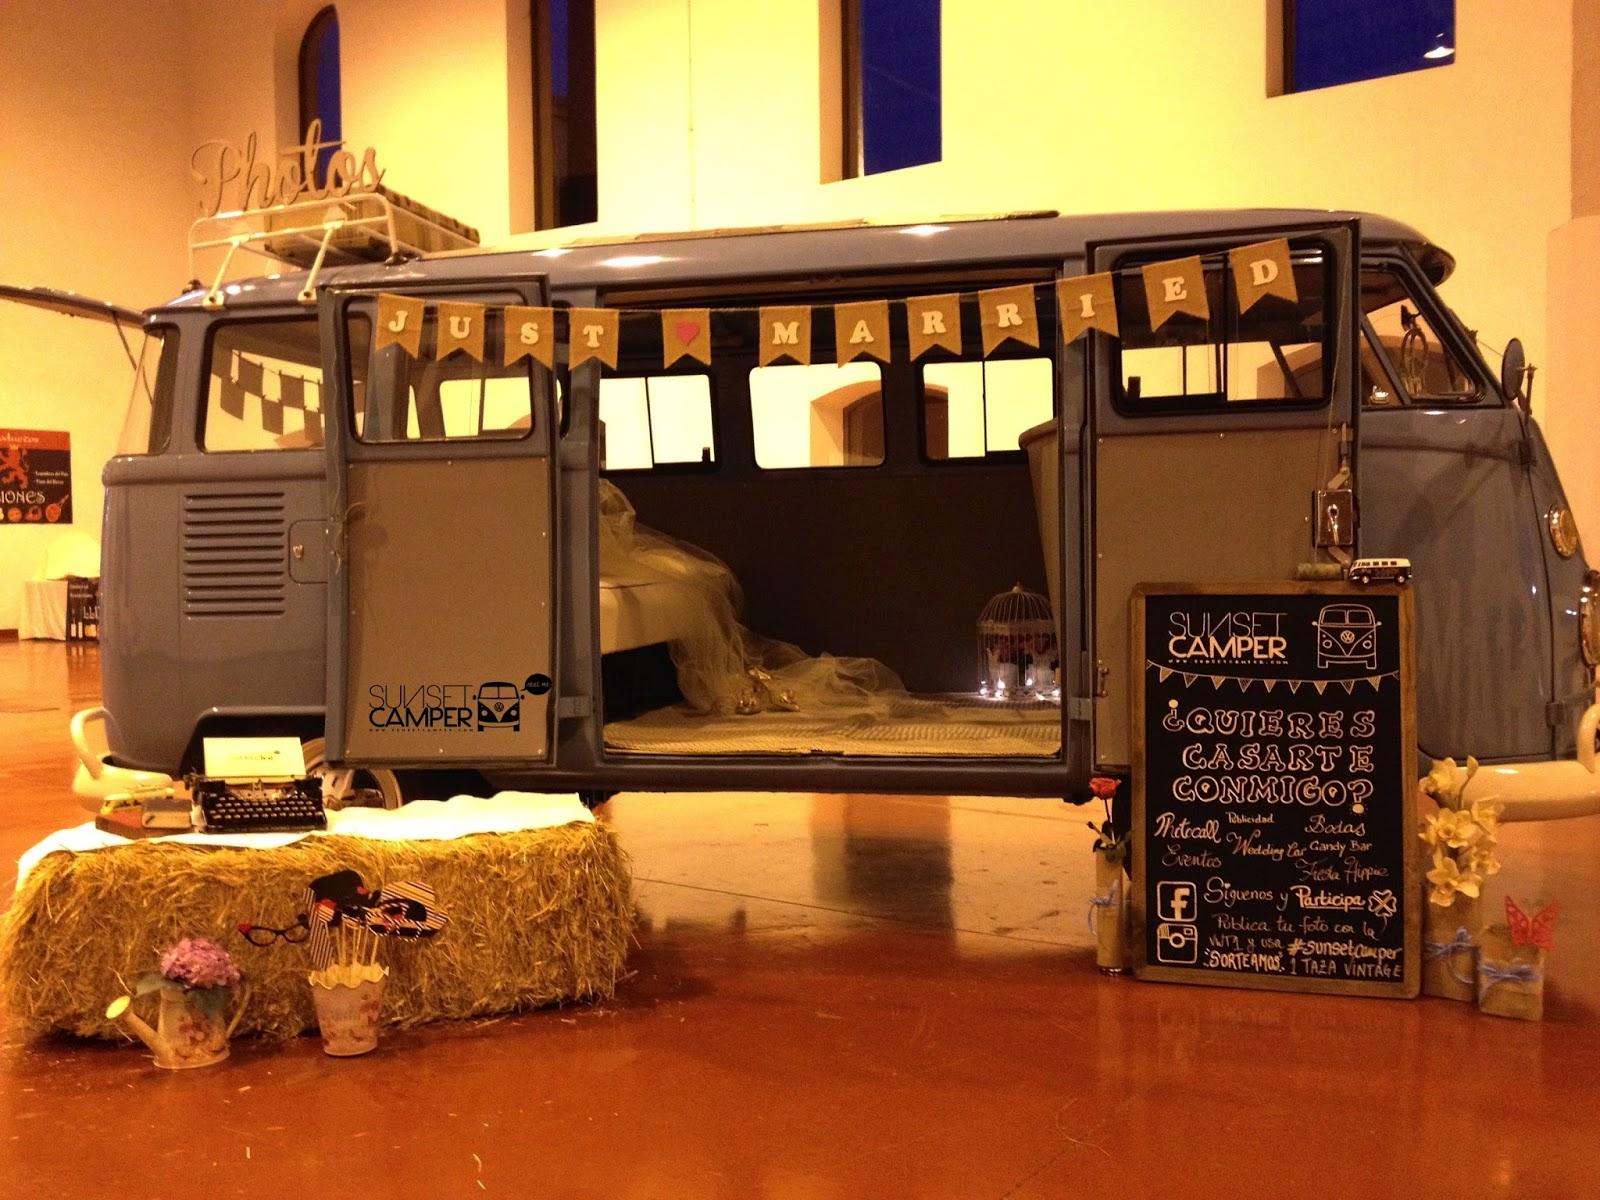 Alquiler furgonetas camper en cantabria for Alquiler decoracion bodas